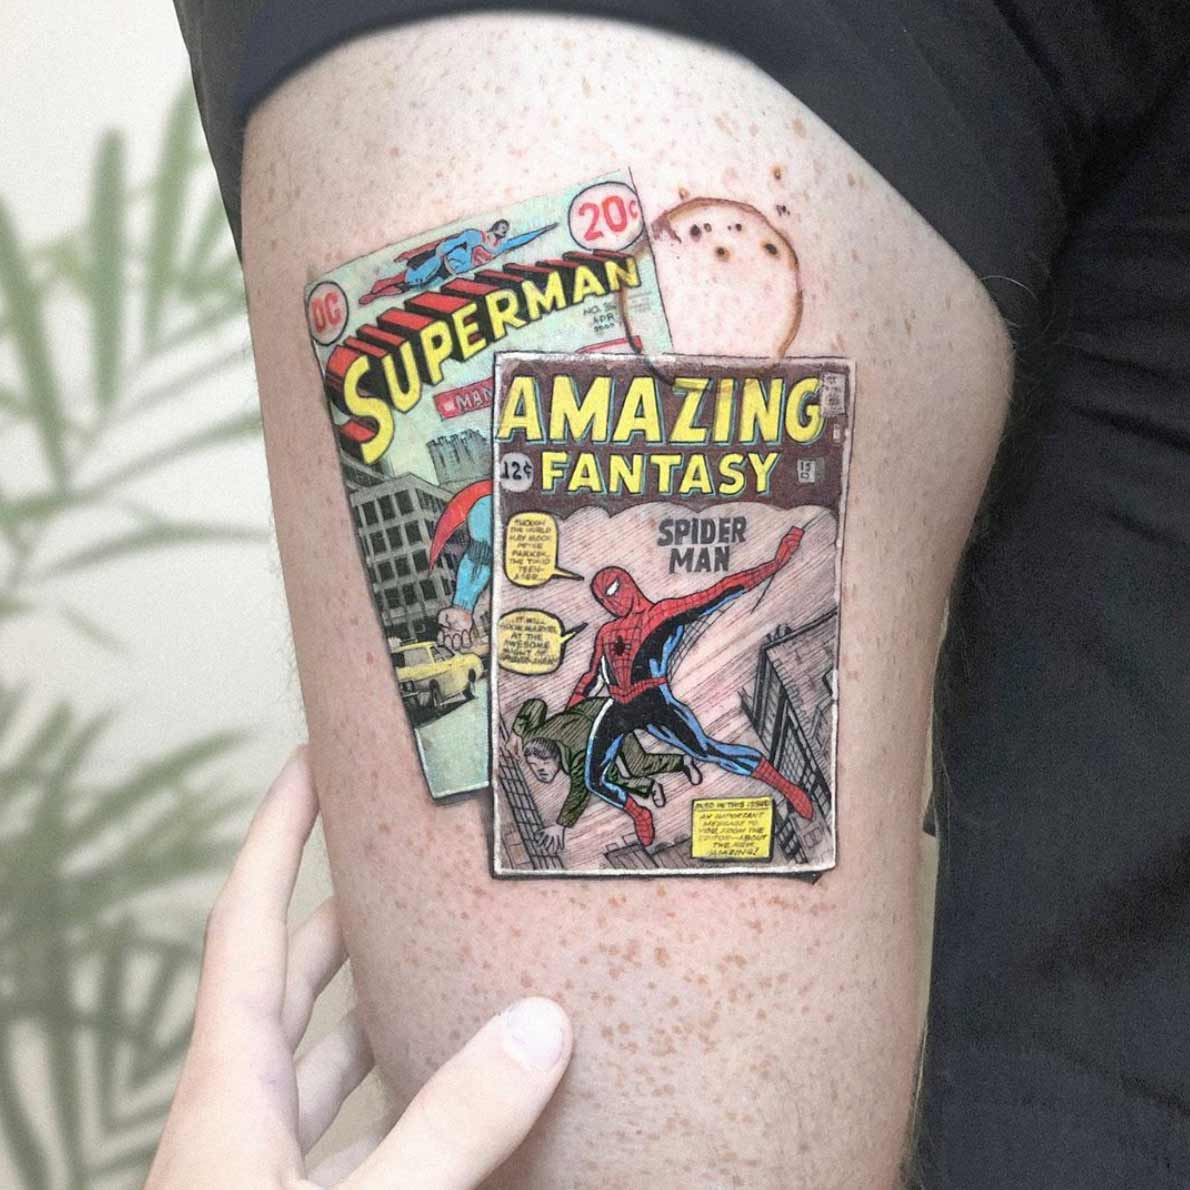 Gestochene Popkultur-Liebe von Eden Kozokaro aka Kozo Tattoo kozo-tattoos_11